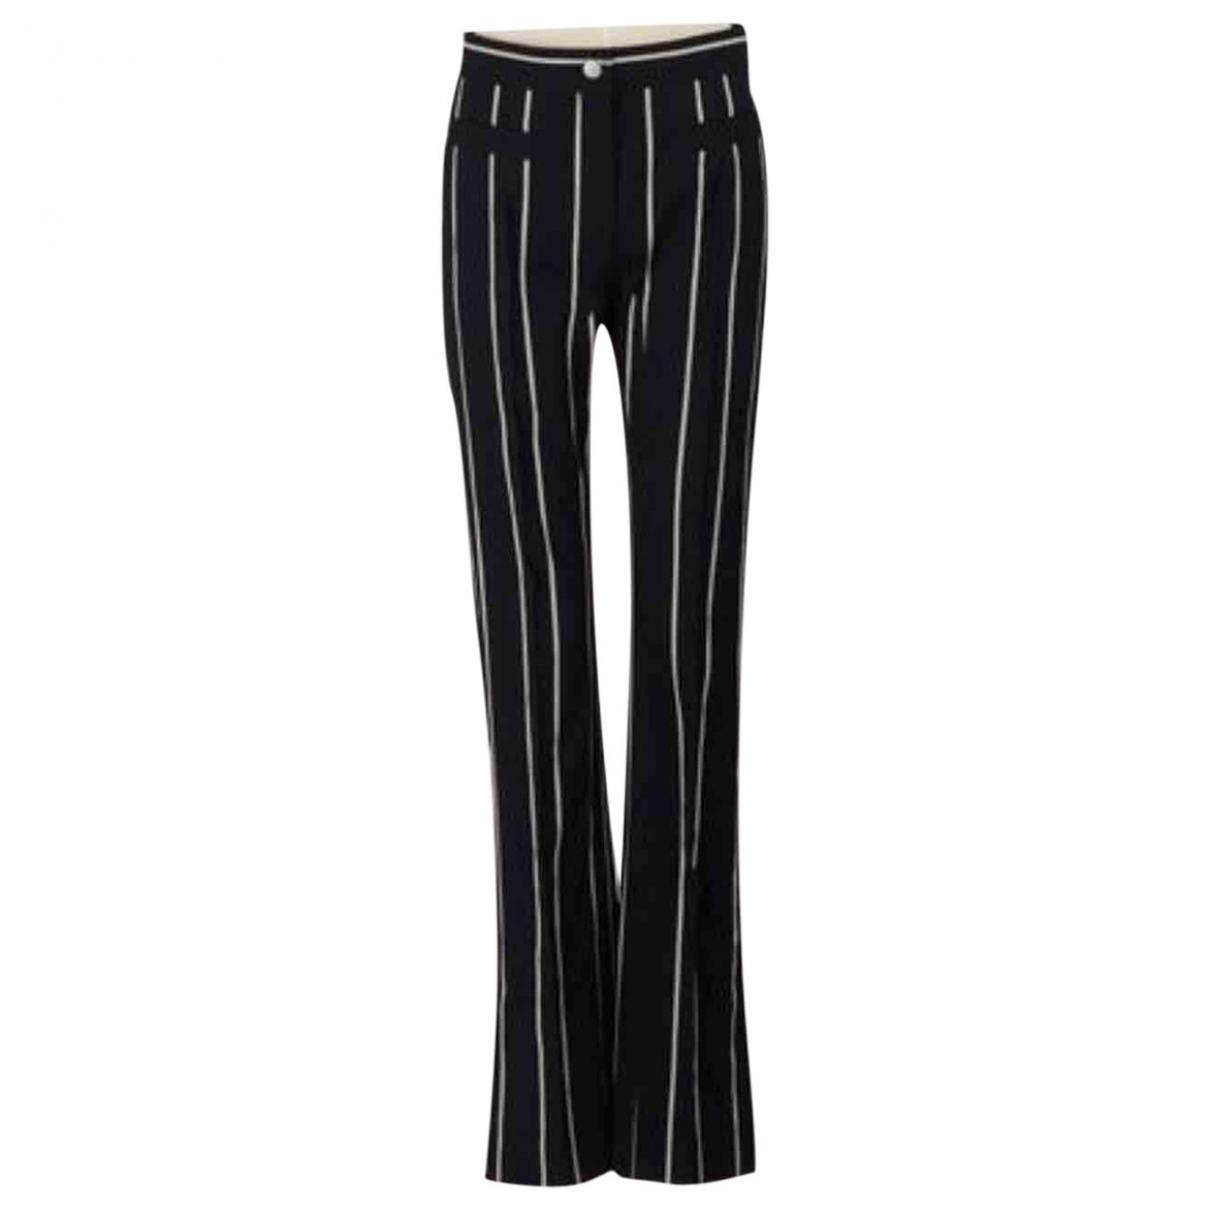 Celine \N Black Cotton Trousers for Women 38 FR